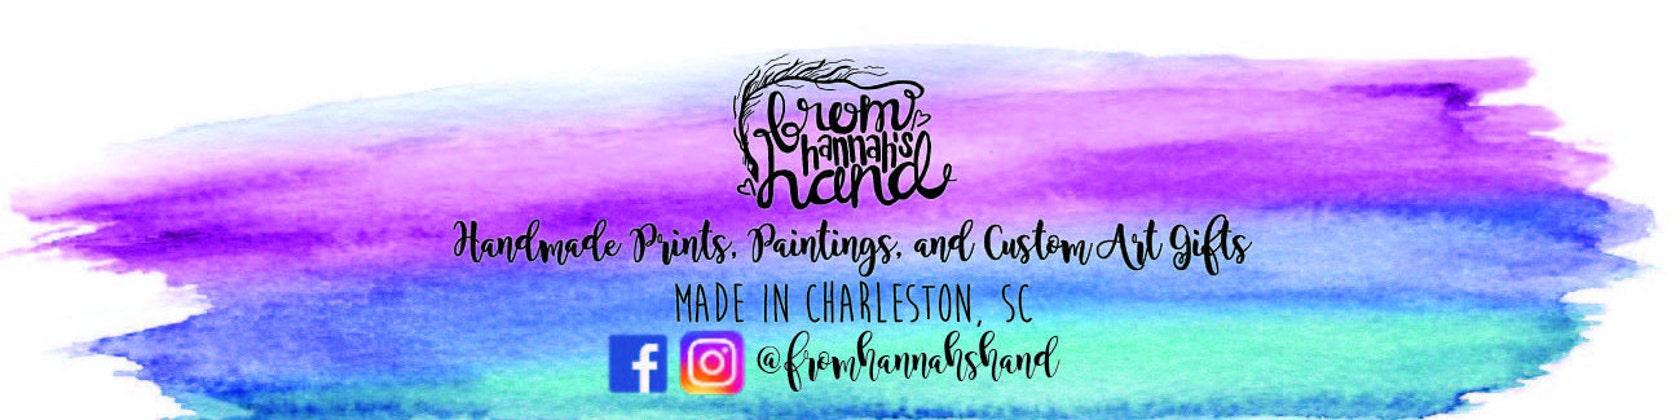 Handmade prints cards custom art gifts by fromhannahshand fromhannahshand handmade prints cards custom art gifts charleston south carolina negle Gallery